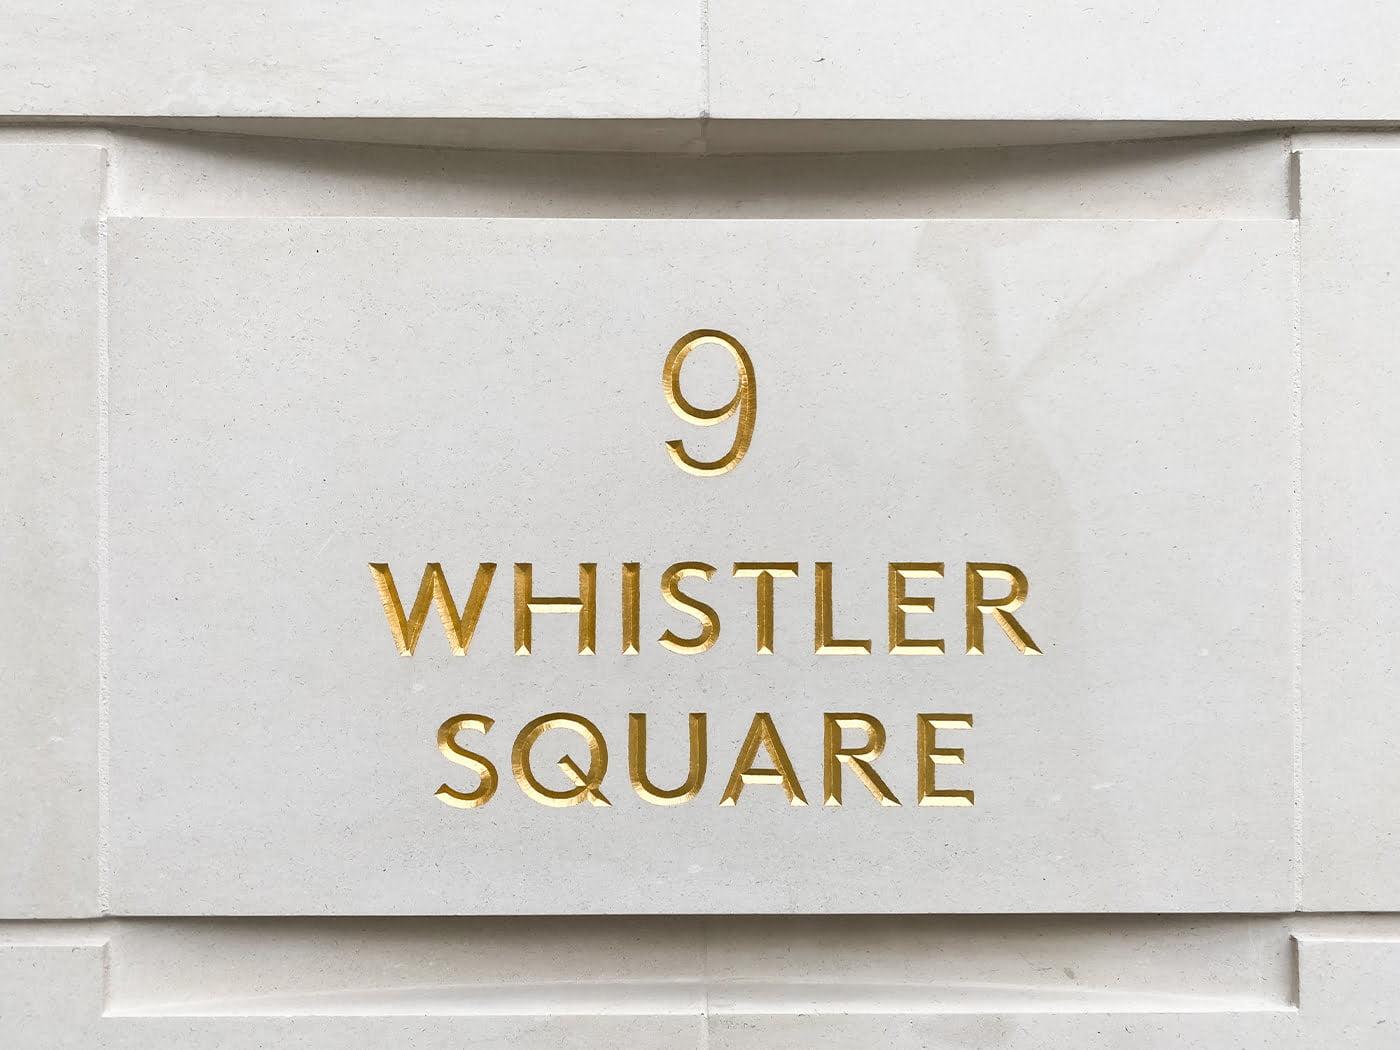 Whistler Square stone engraved signage